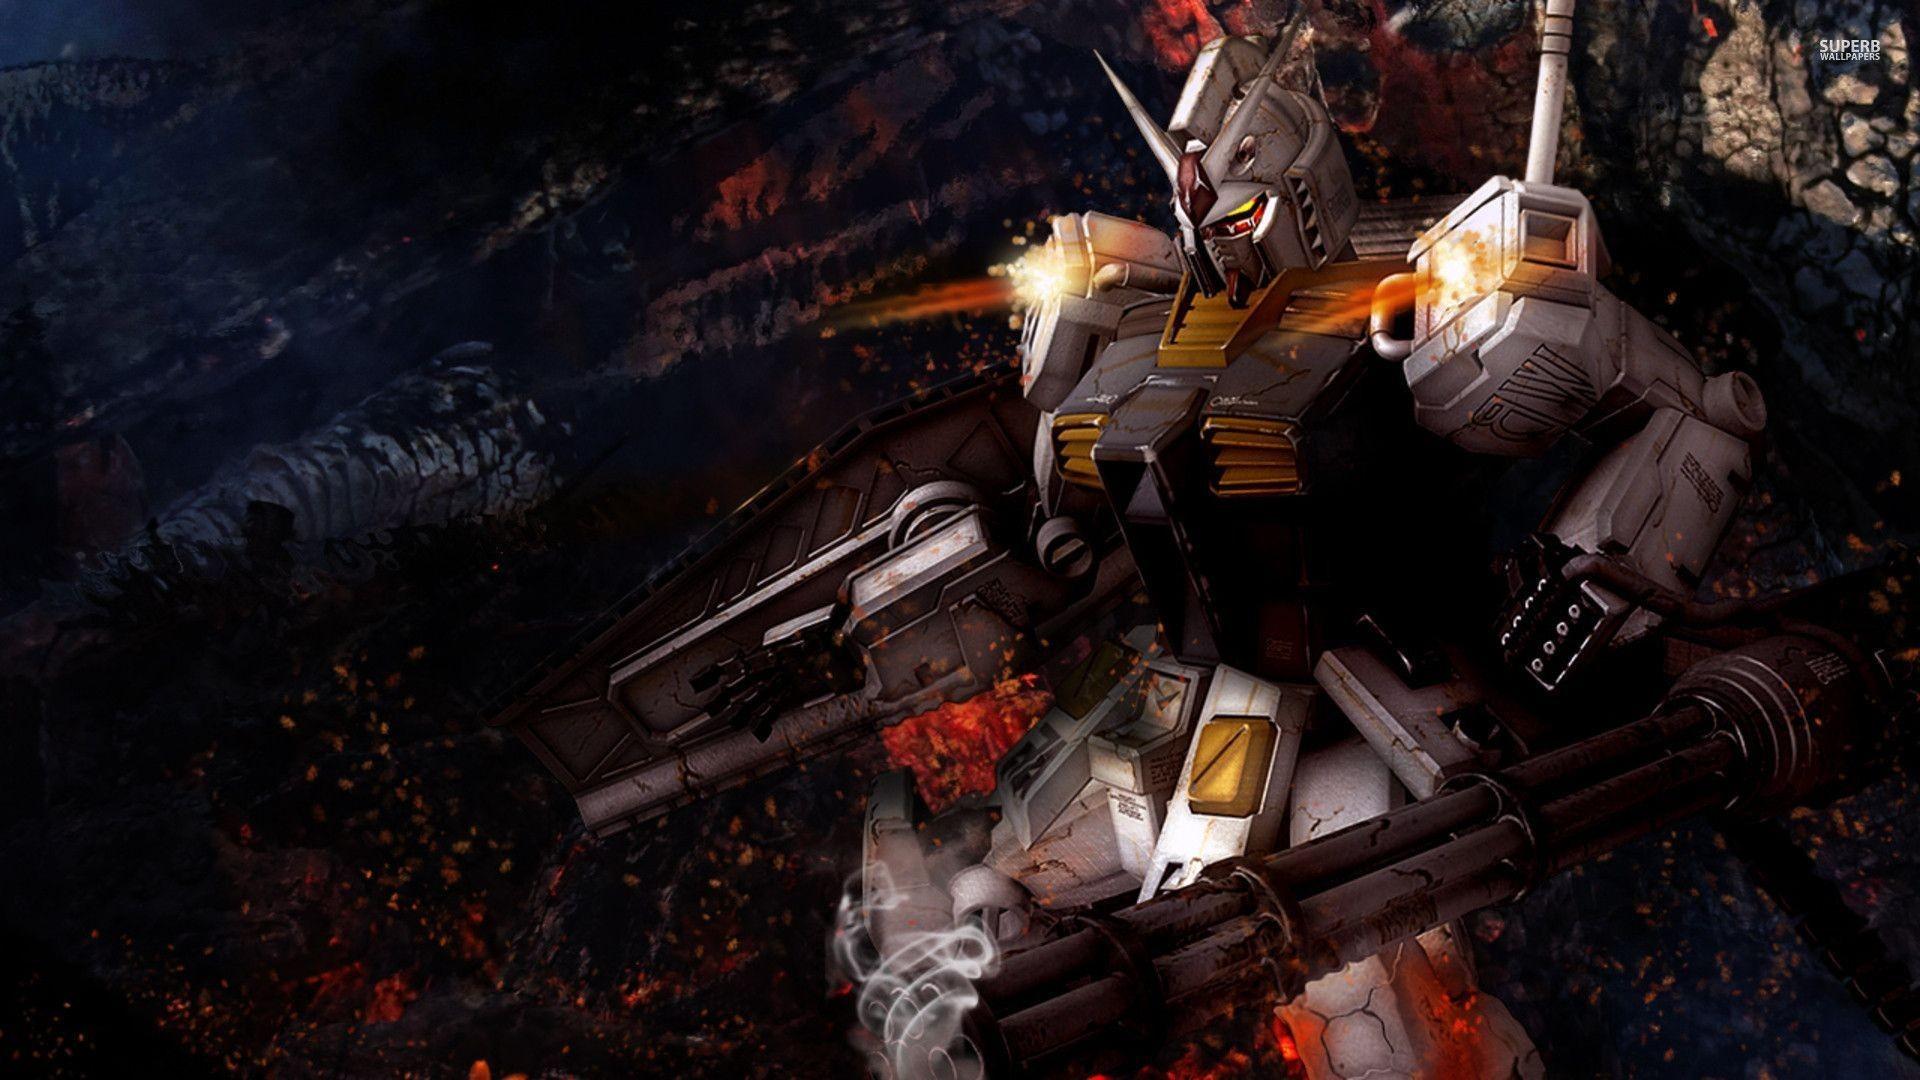 MS-06 Zaku II – Gundam wallpaper – Anime wallpapers – #30250